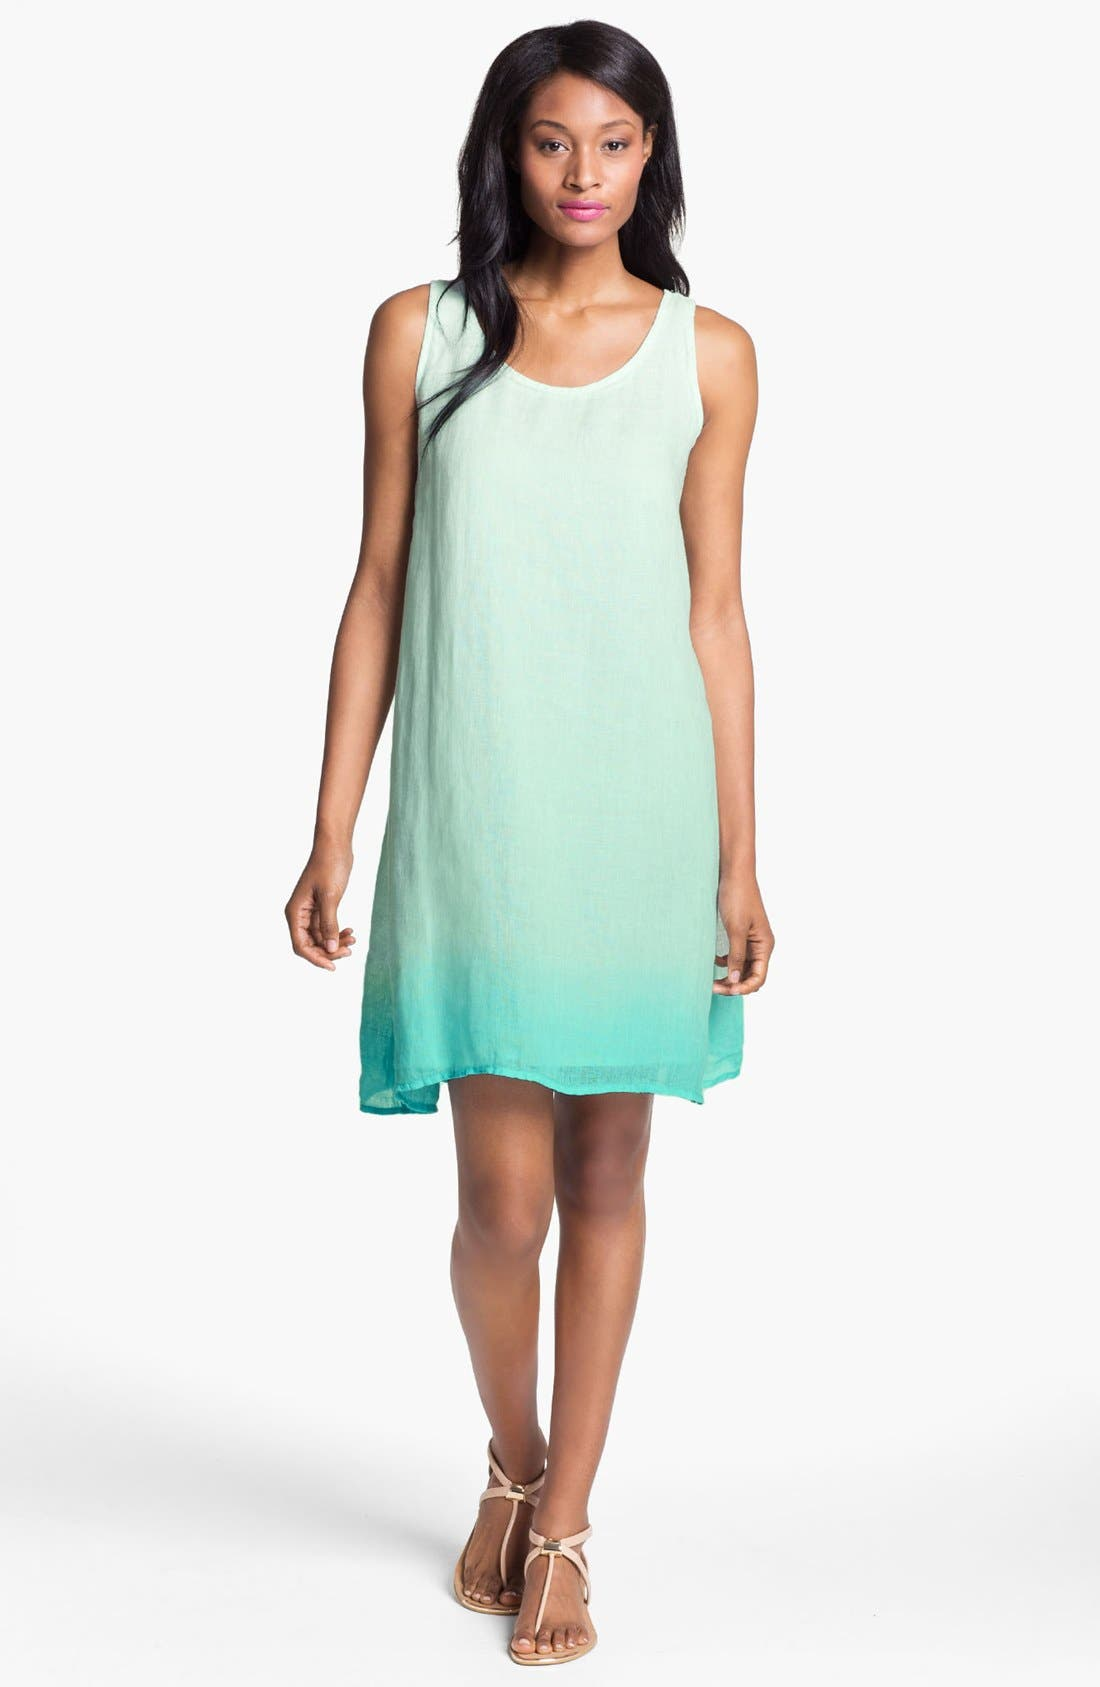 Alternate Image 1 Selected - Eileen Fisher Ombré Linen Dress